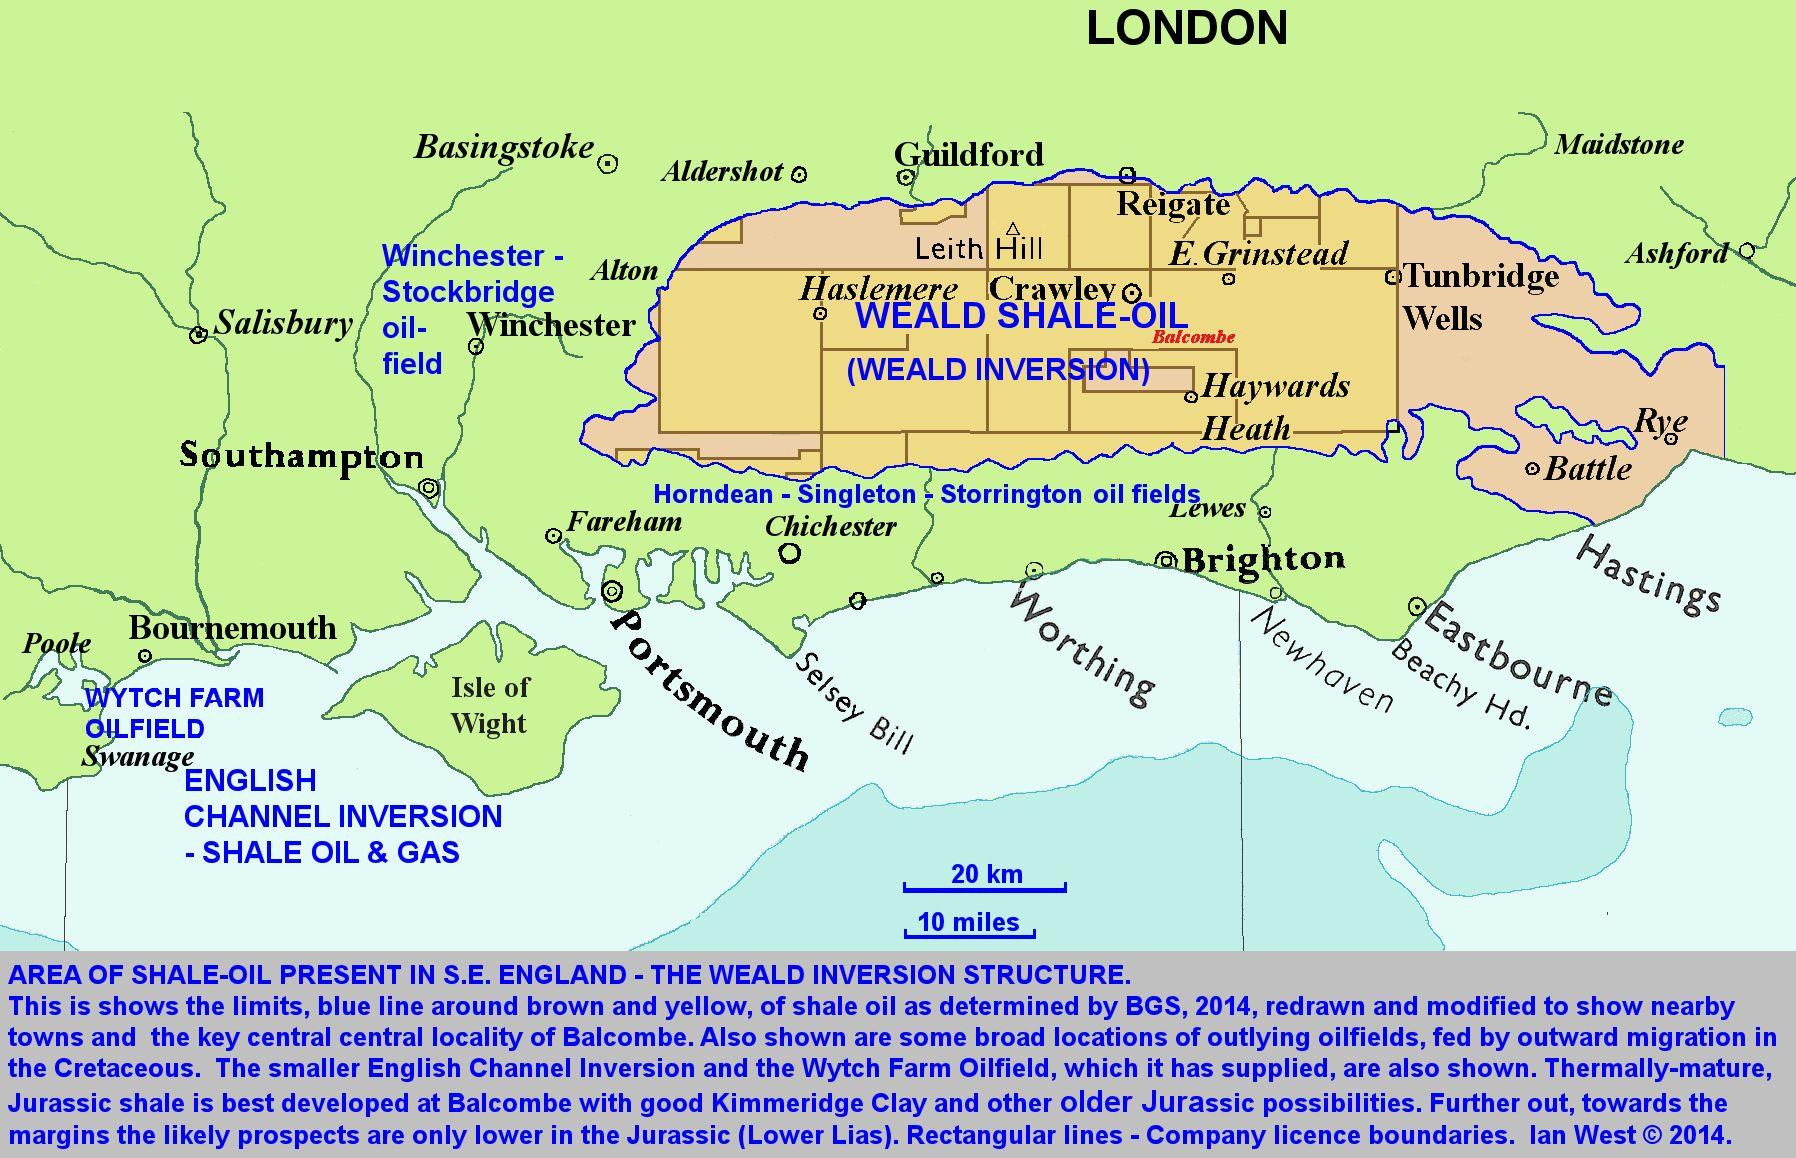 Petroleum Geology of the Weald - Shale Oil on kent station map, kent island map, dover england on map, devon england uk map, kent street map, leeds castle england on map, kent county map, new england united states map, faversham kent map, england ocean map, dover france map, new england weather map, scotland map, new england county map, stonehenge england location map, isle of sheppey map, york map, fscj kent campus building map, united kingdom map, england's map,